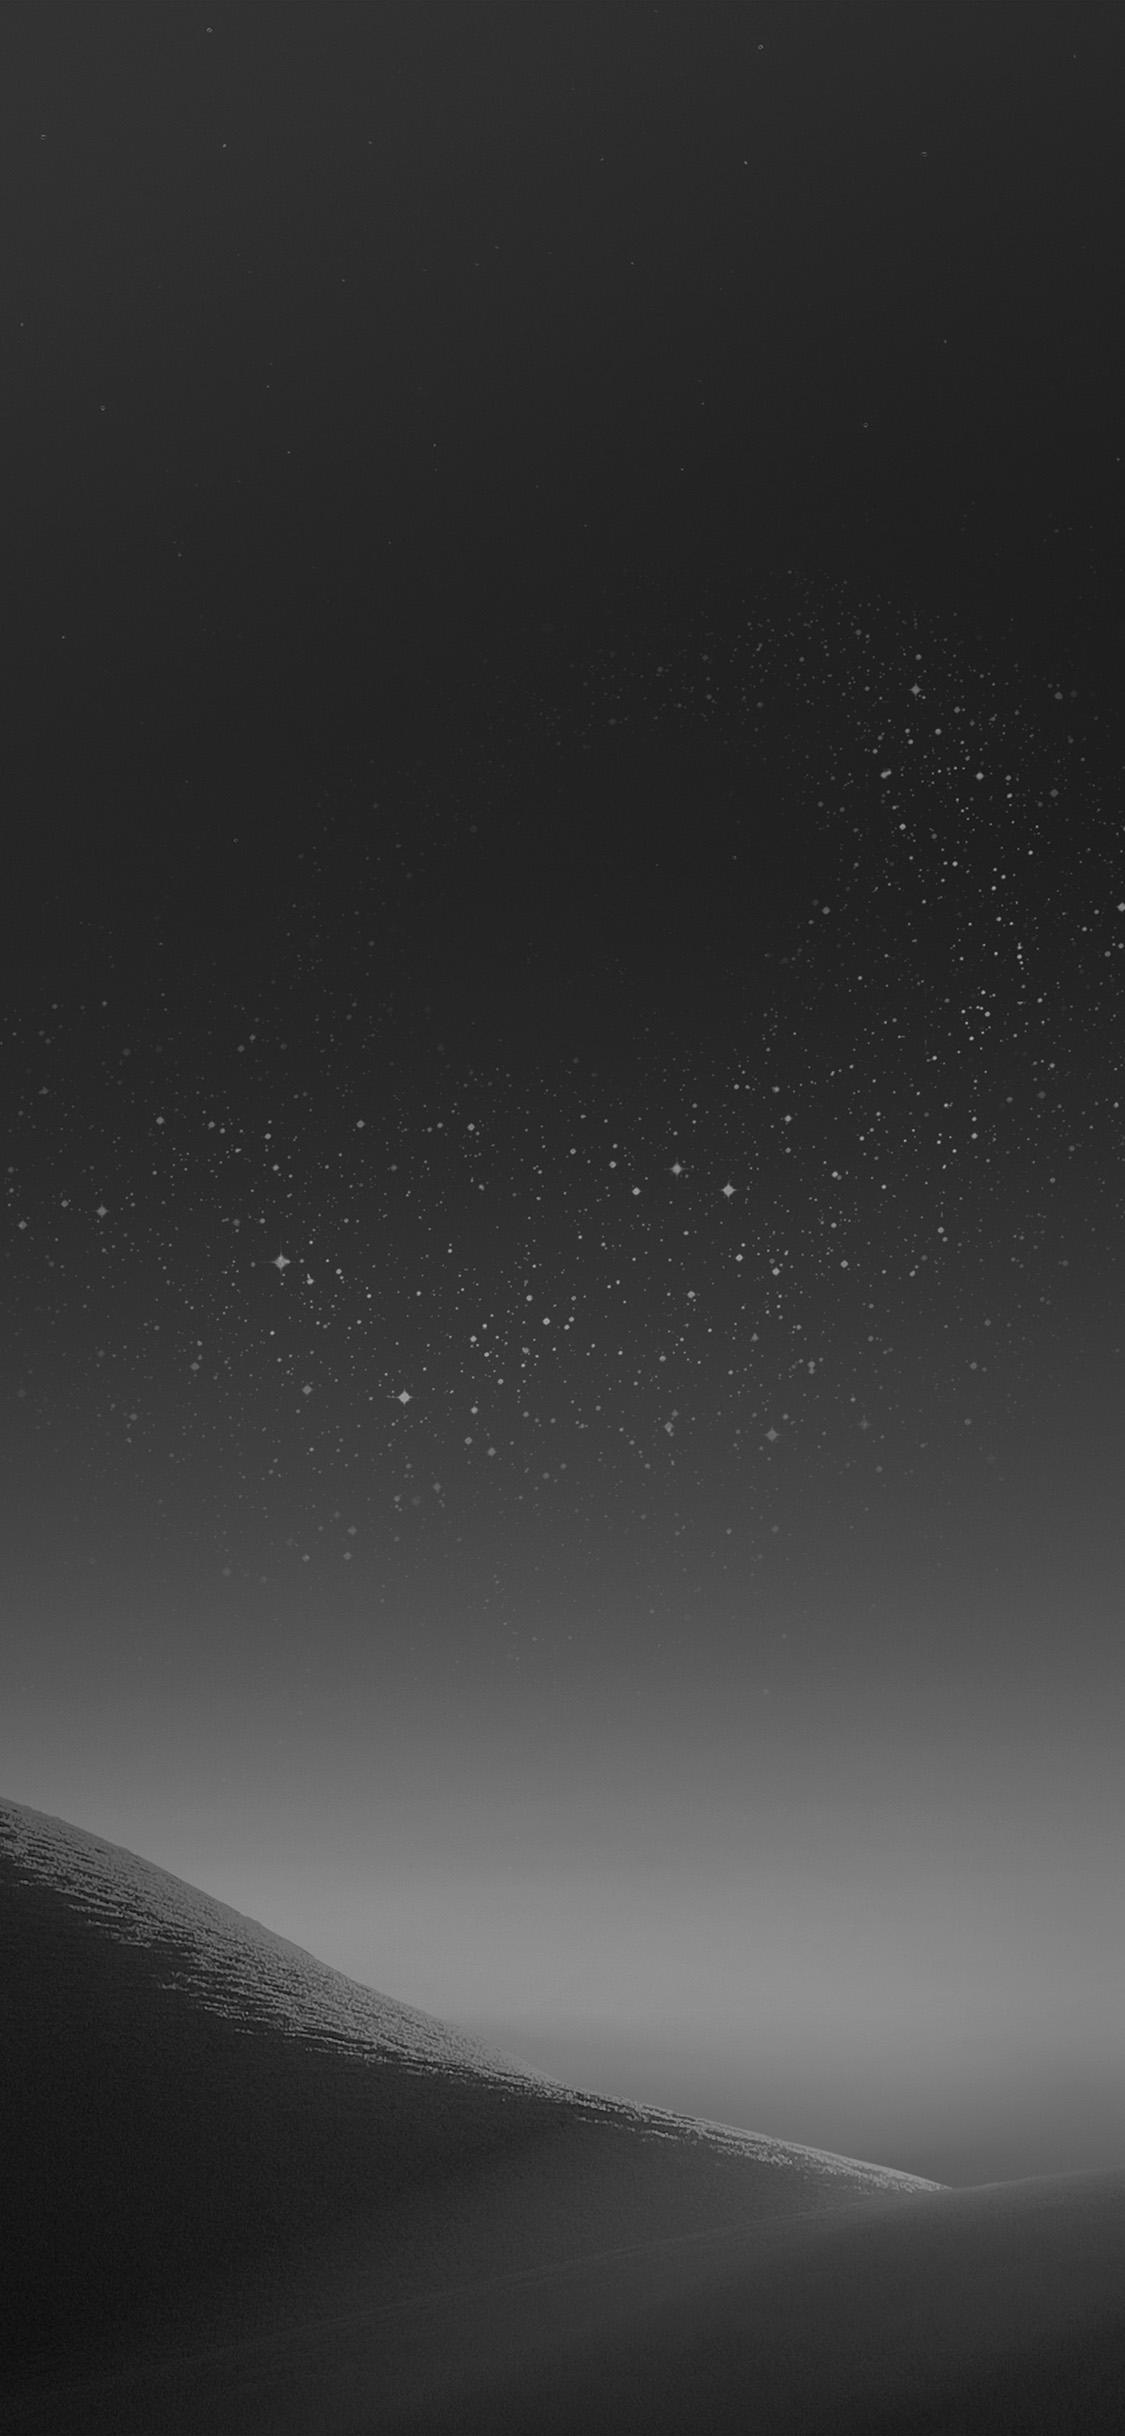 iPhonexpapers.com-Apple-iPhone-wallpaper-bc37-galaxy-night-sky-star-art-illustration-samsung-dark-bw